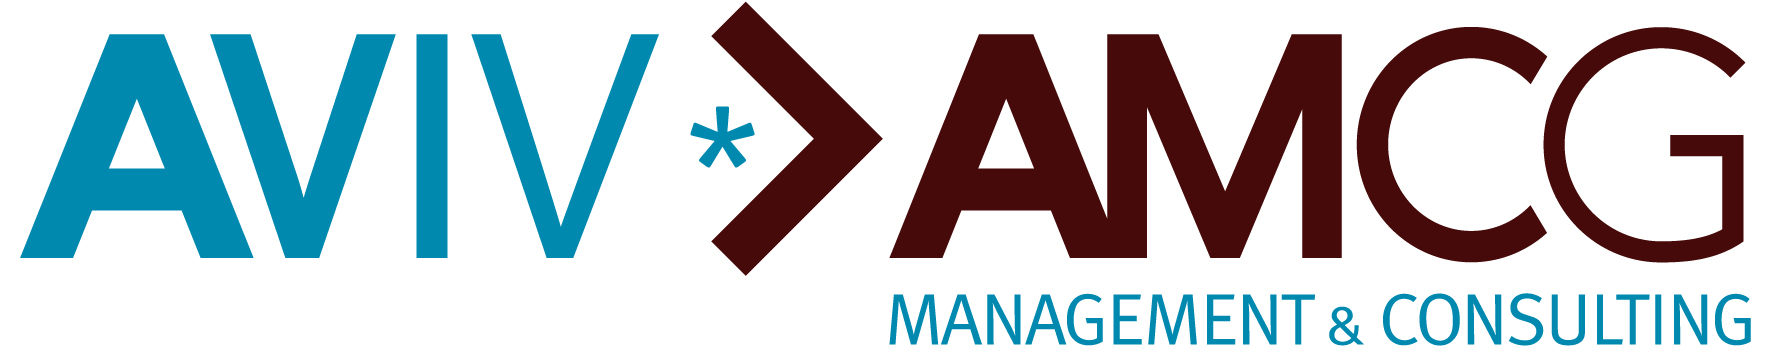 AMCG_logo3